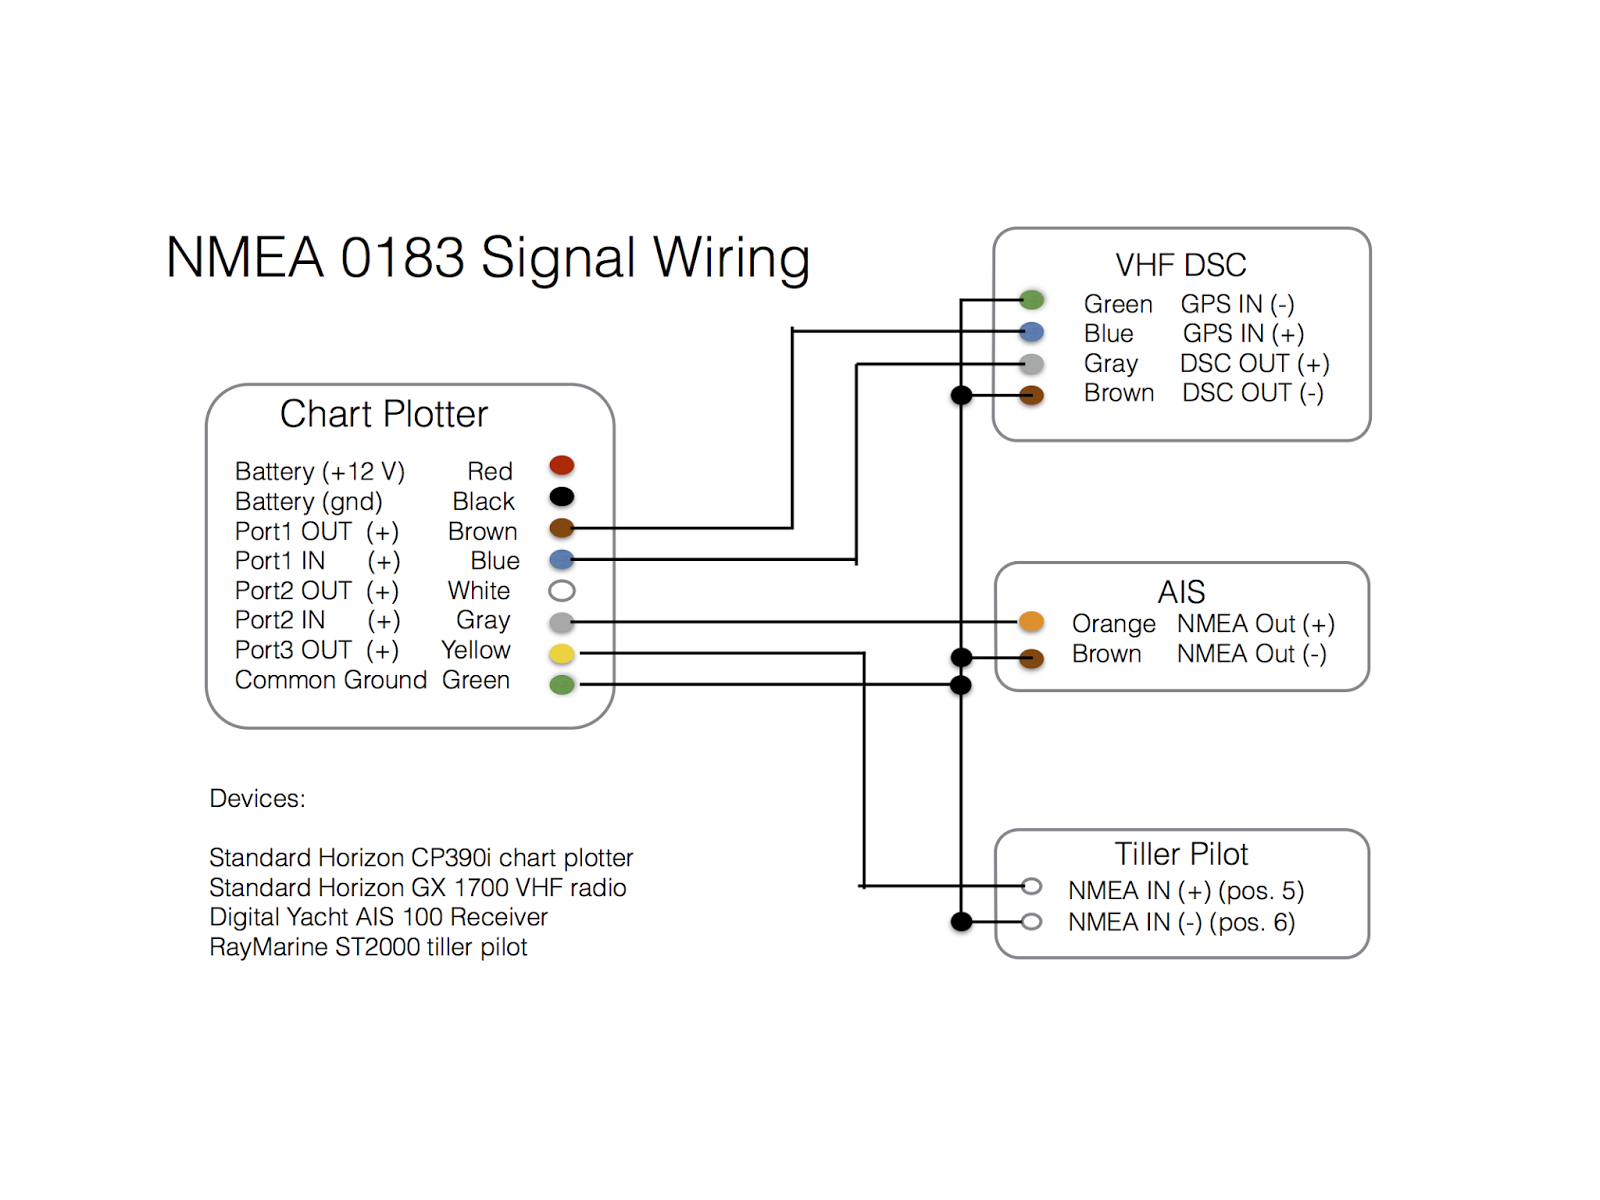 nmea 0183 wiring diagram 24 wiring diagram images [ 1600 x 1200 Pixel ]